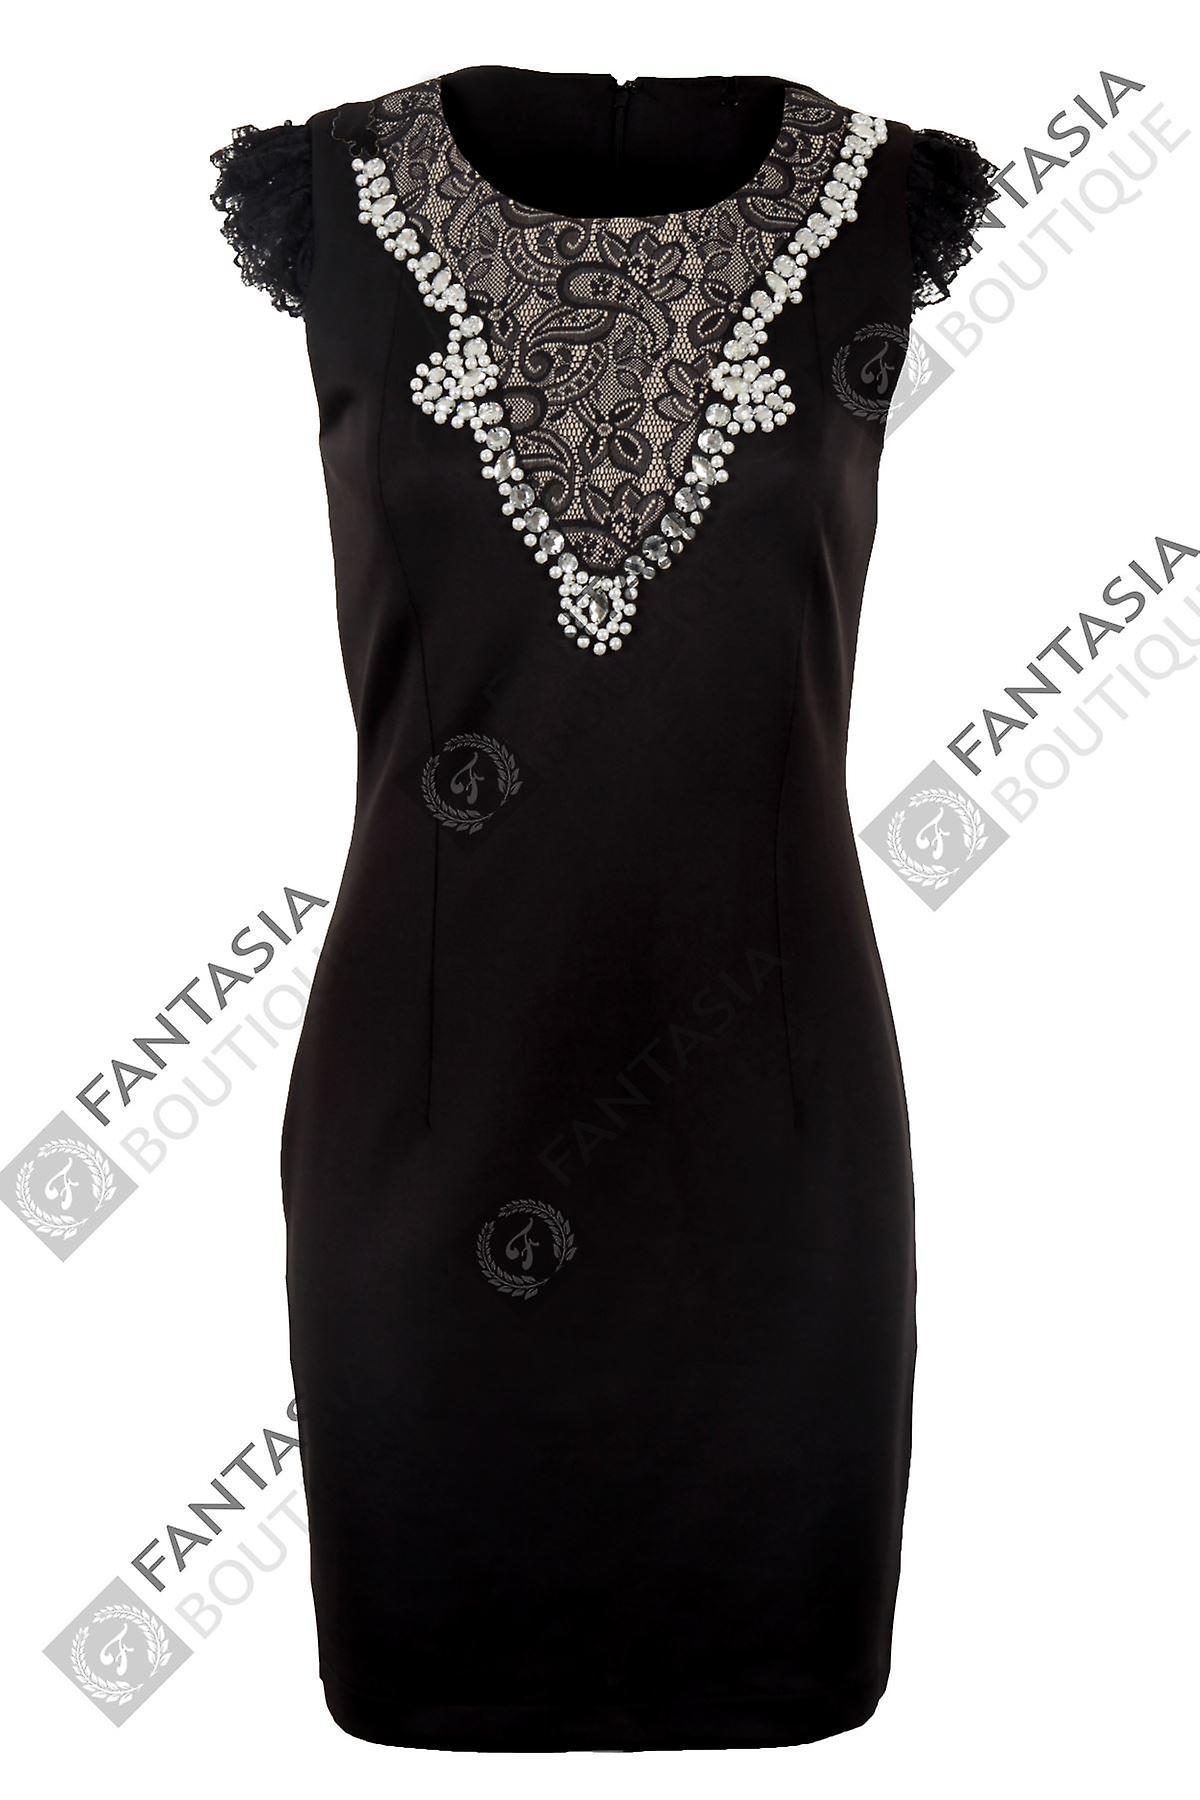 Ladies Cap Sleeve Lace Diamante Pearl Slim Stretch Bodycon Women's Short Dress